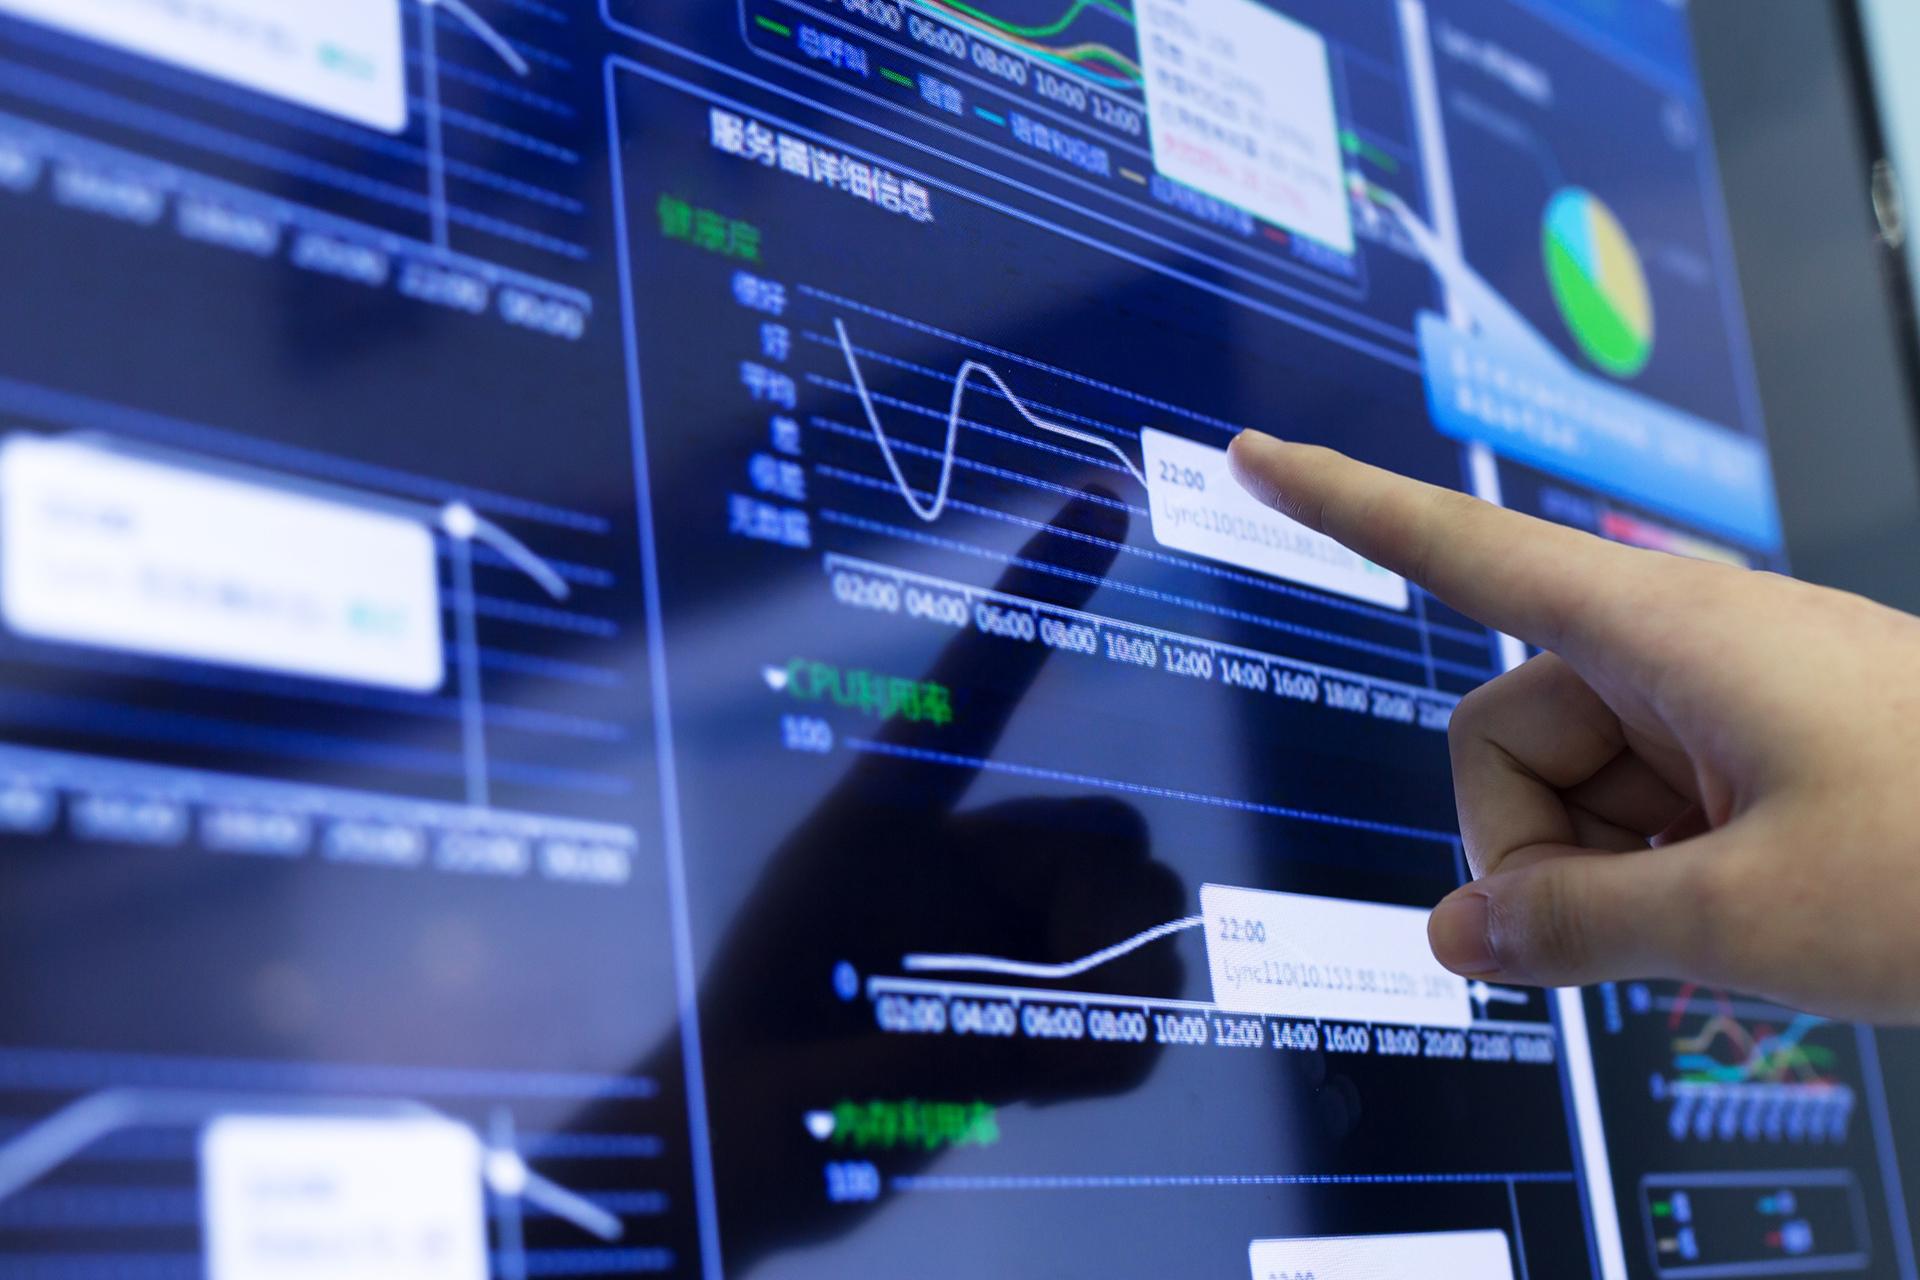 Herramienta online financiera